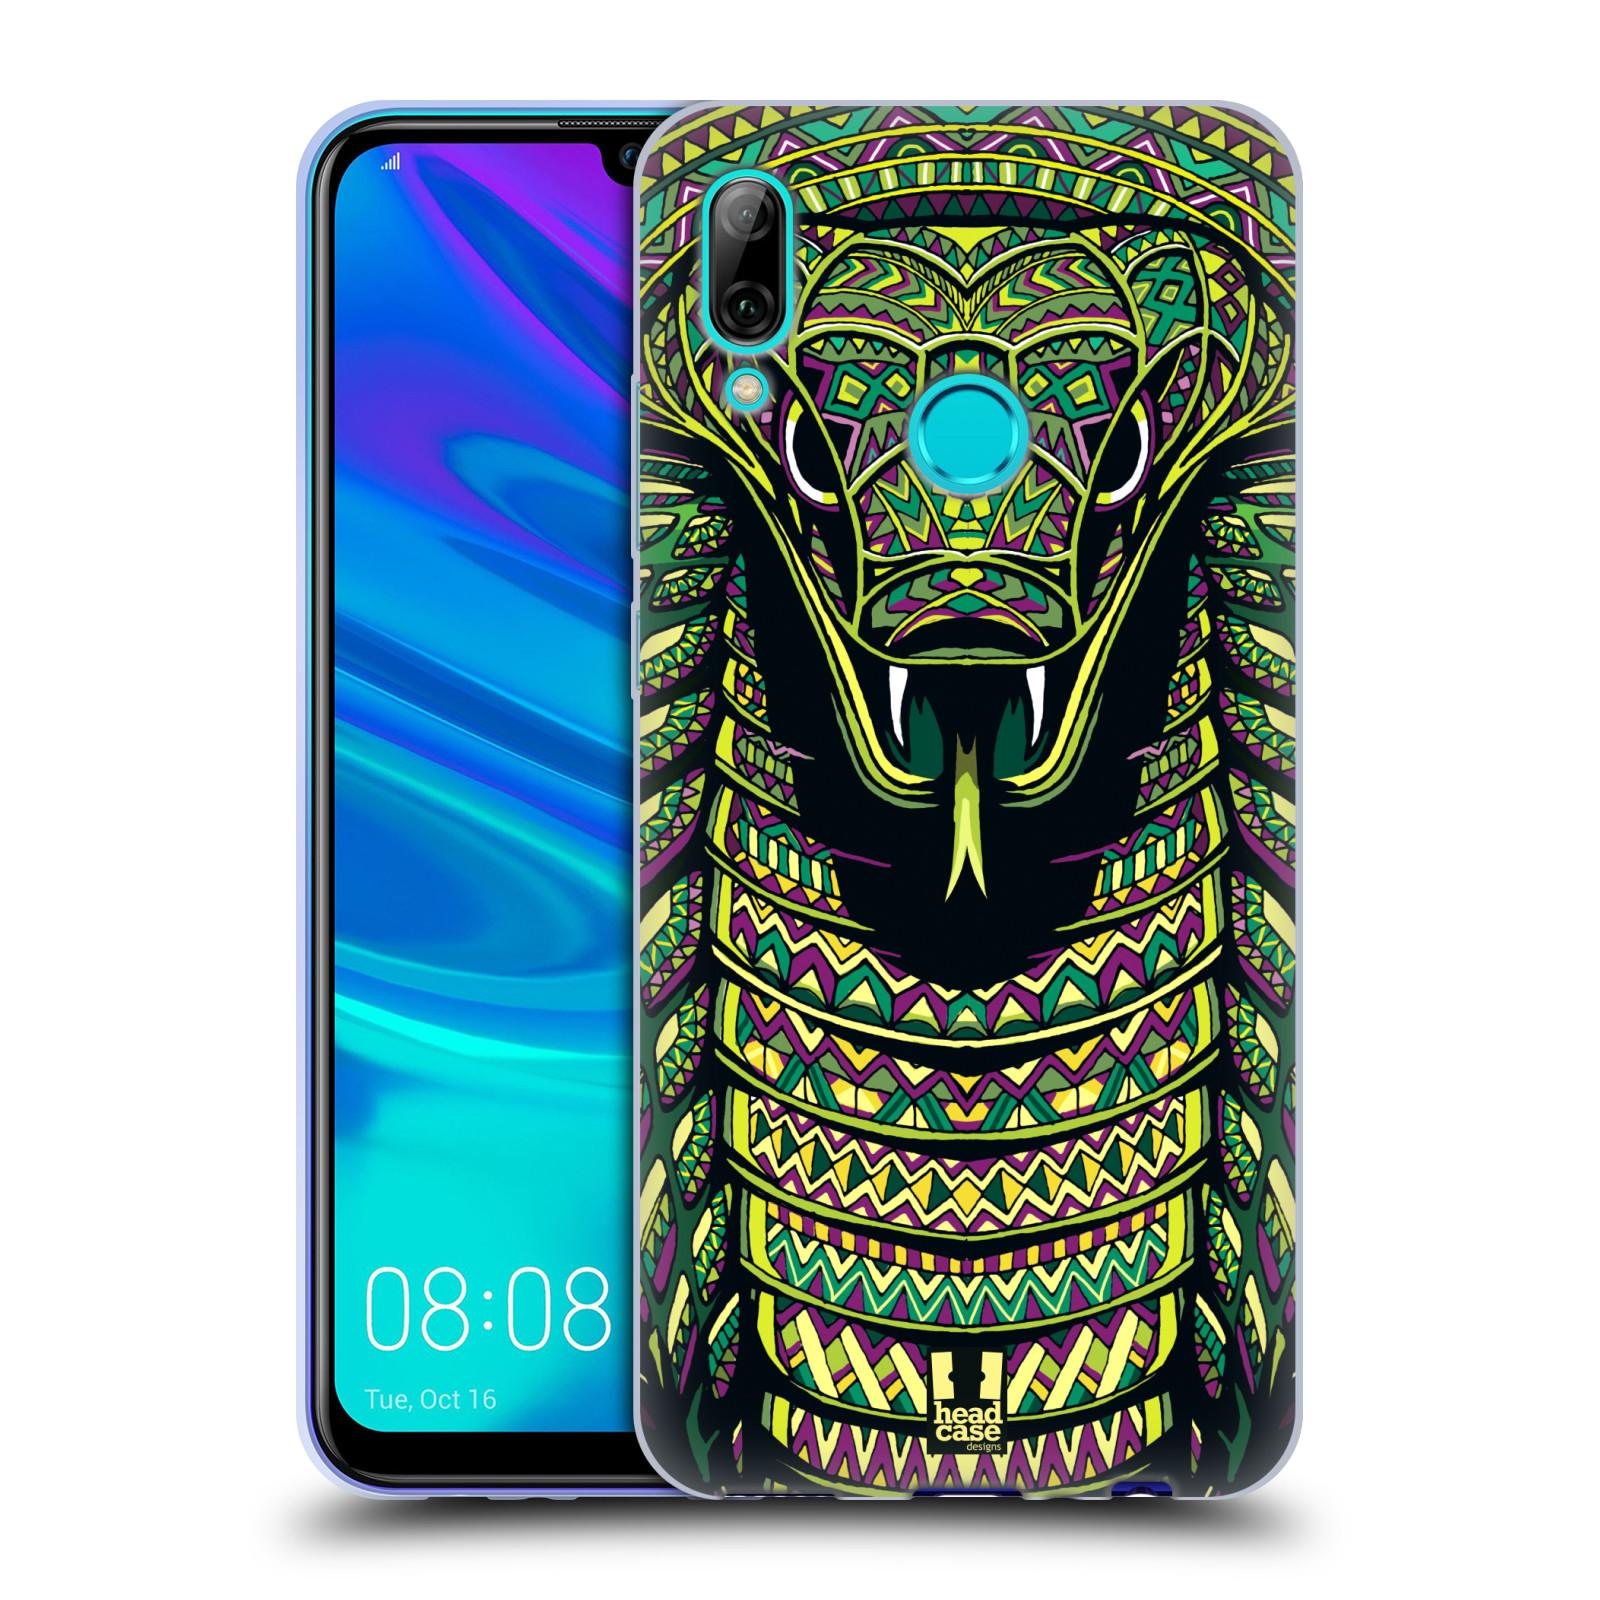 Silikonové pouzdro na mobil Huawei P Smart (2019) - Head Case - AZTEC HAD